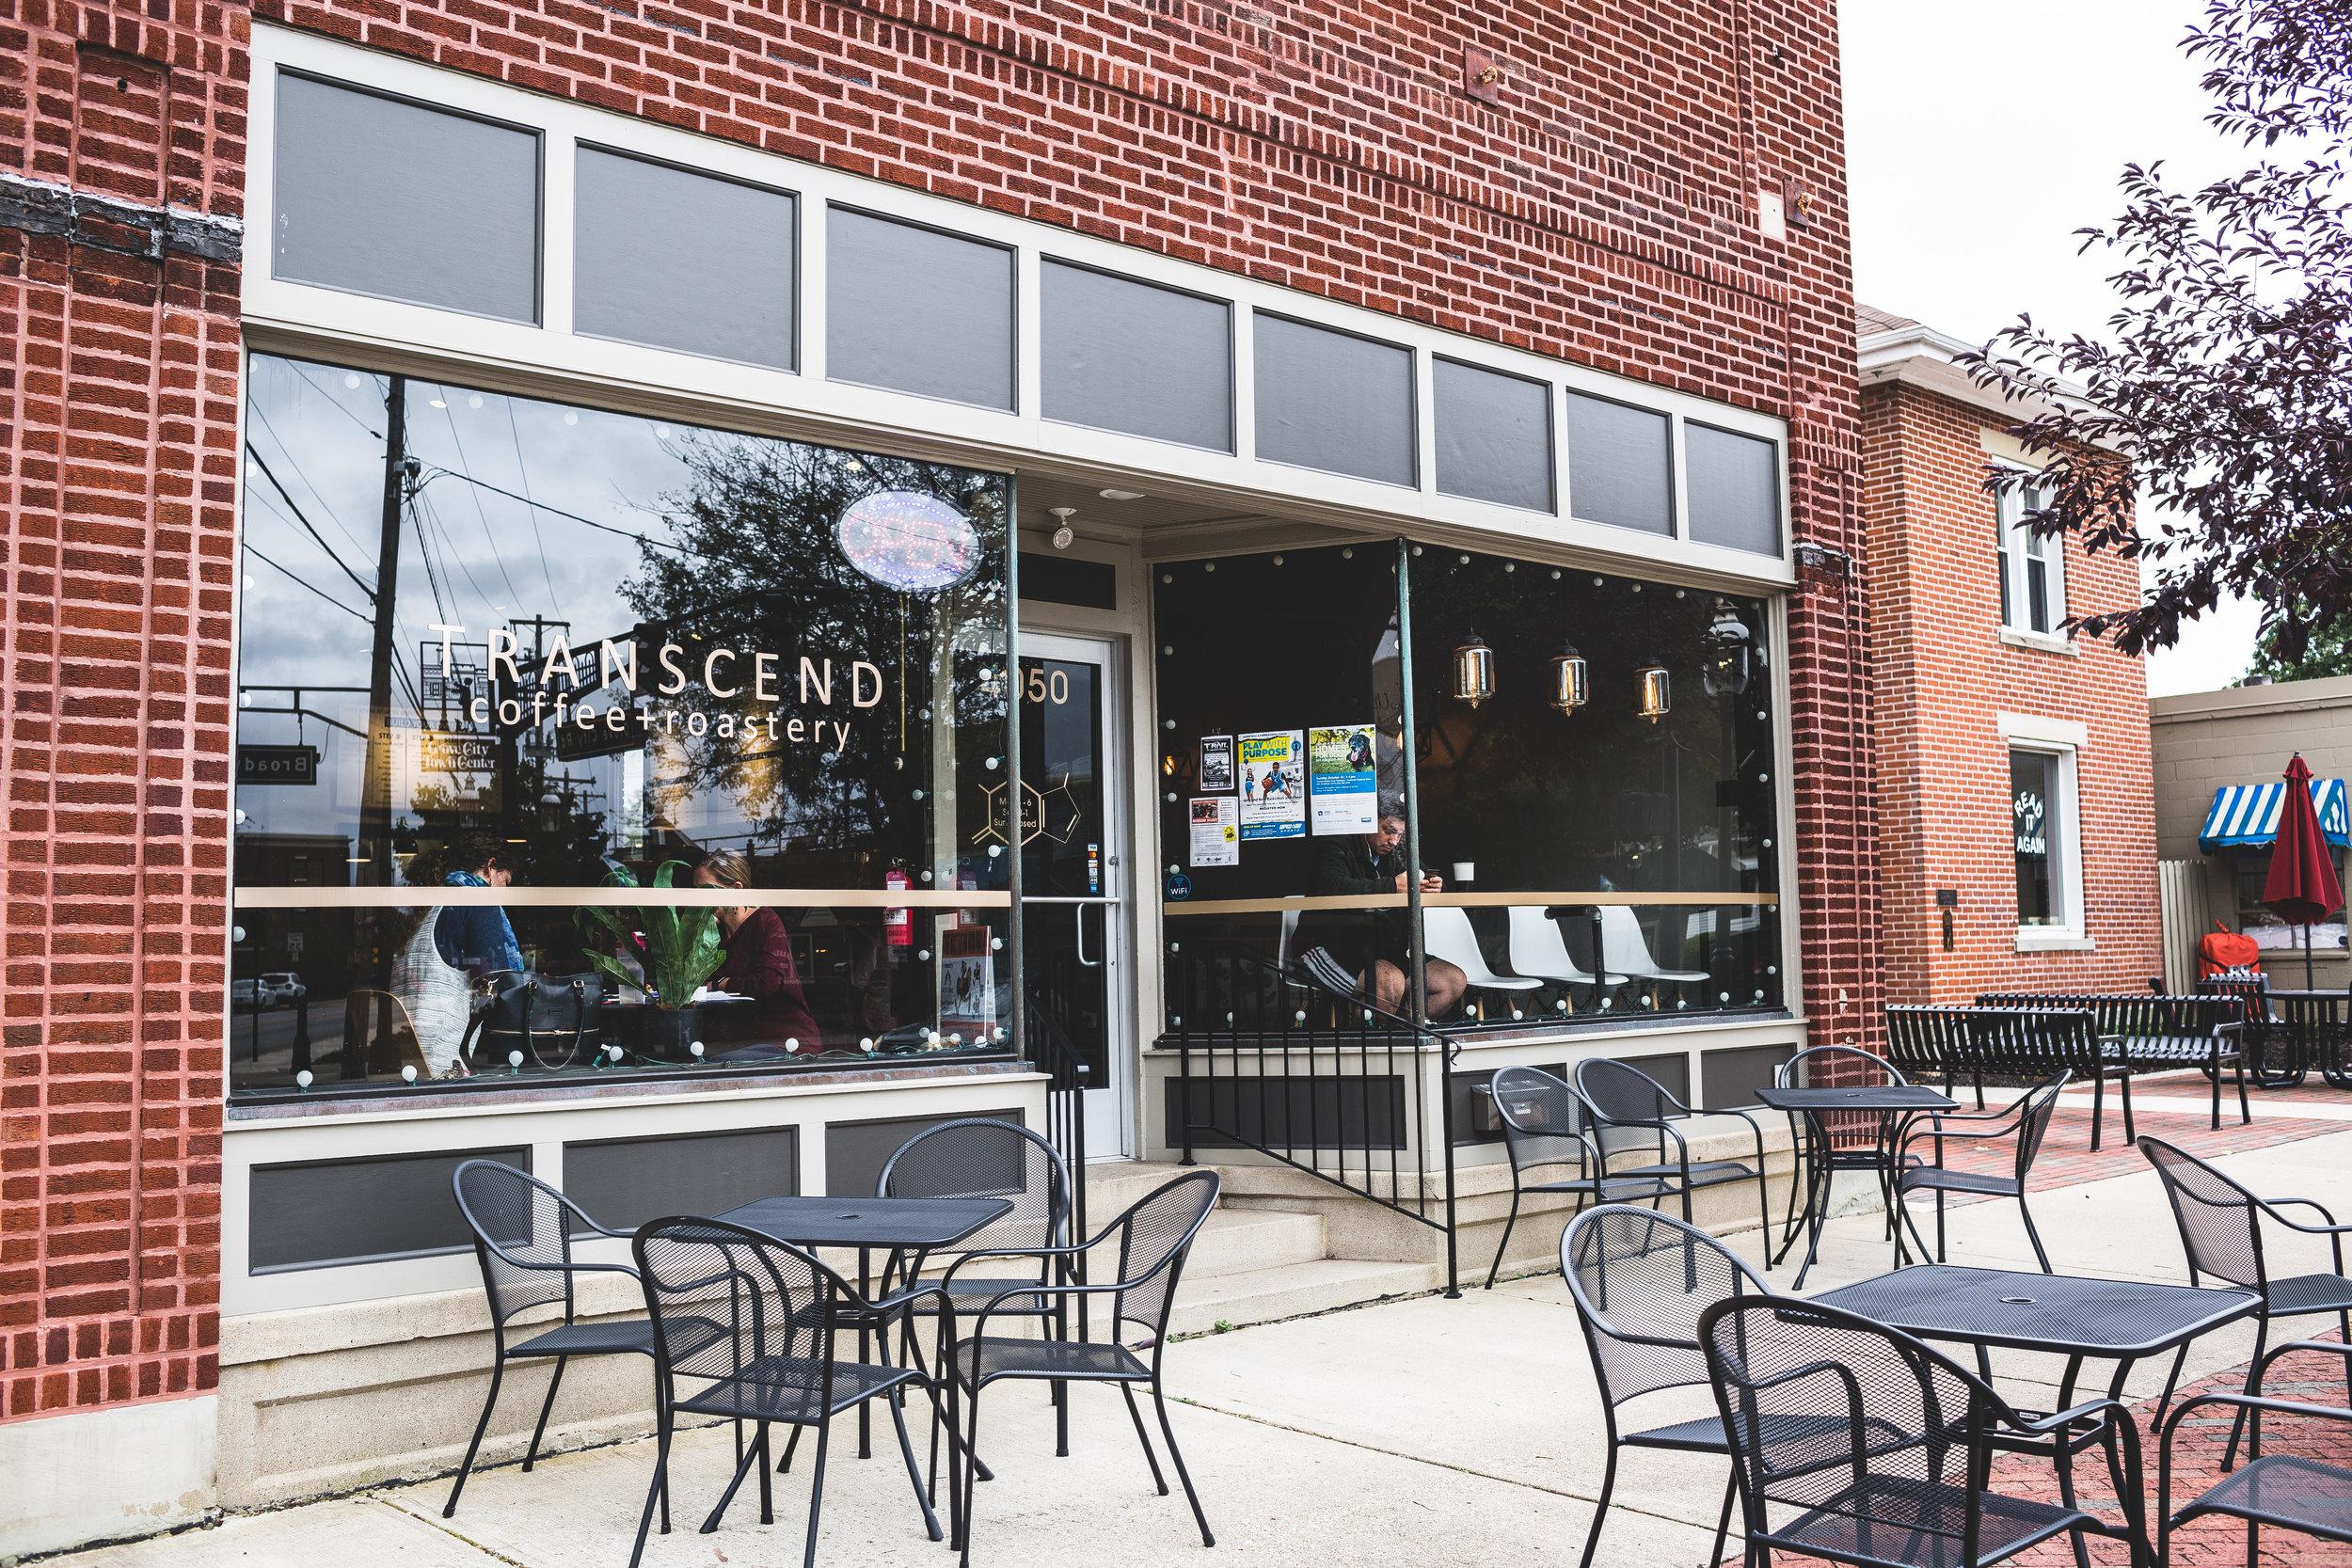 Transcend Coffee Shop exterior modern